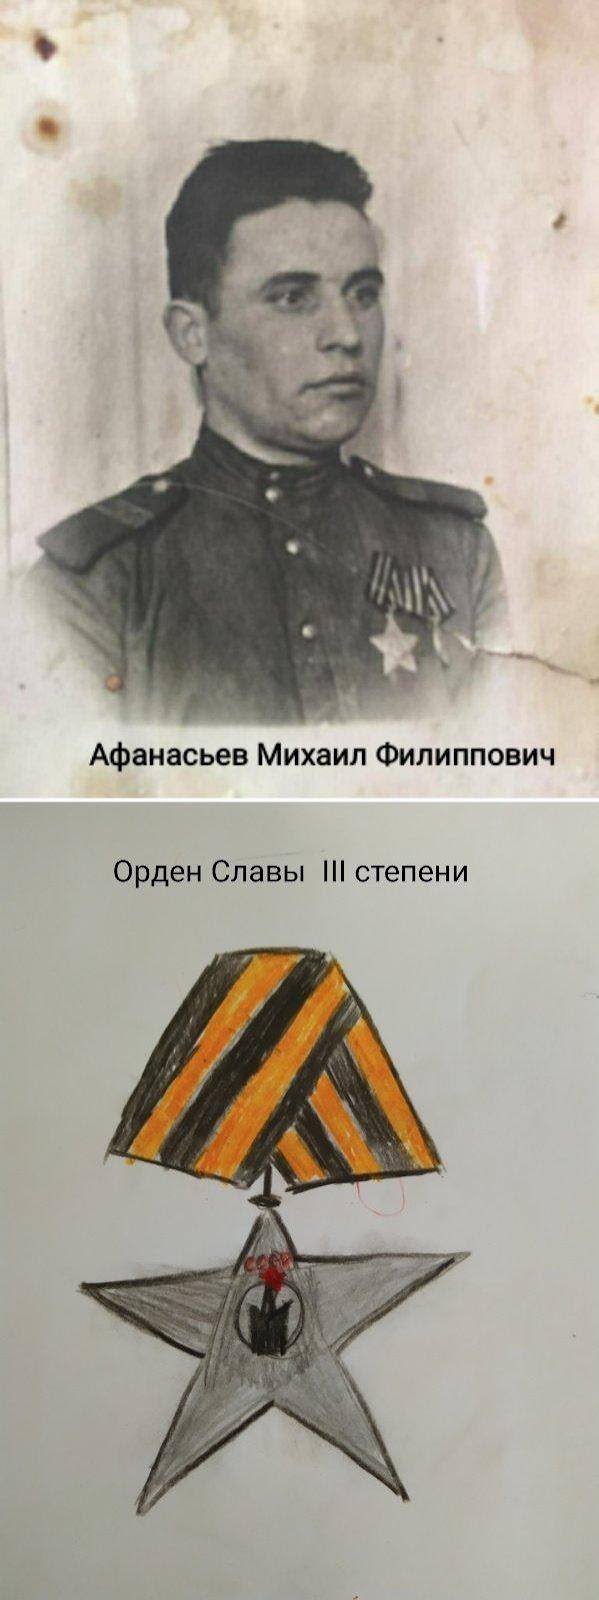 C:\Users\user\Downloads\Прадед Вовы Чижмака, 35 группа.jpg